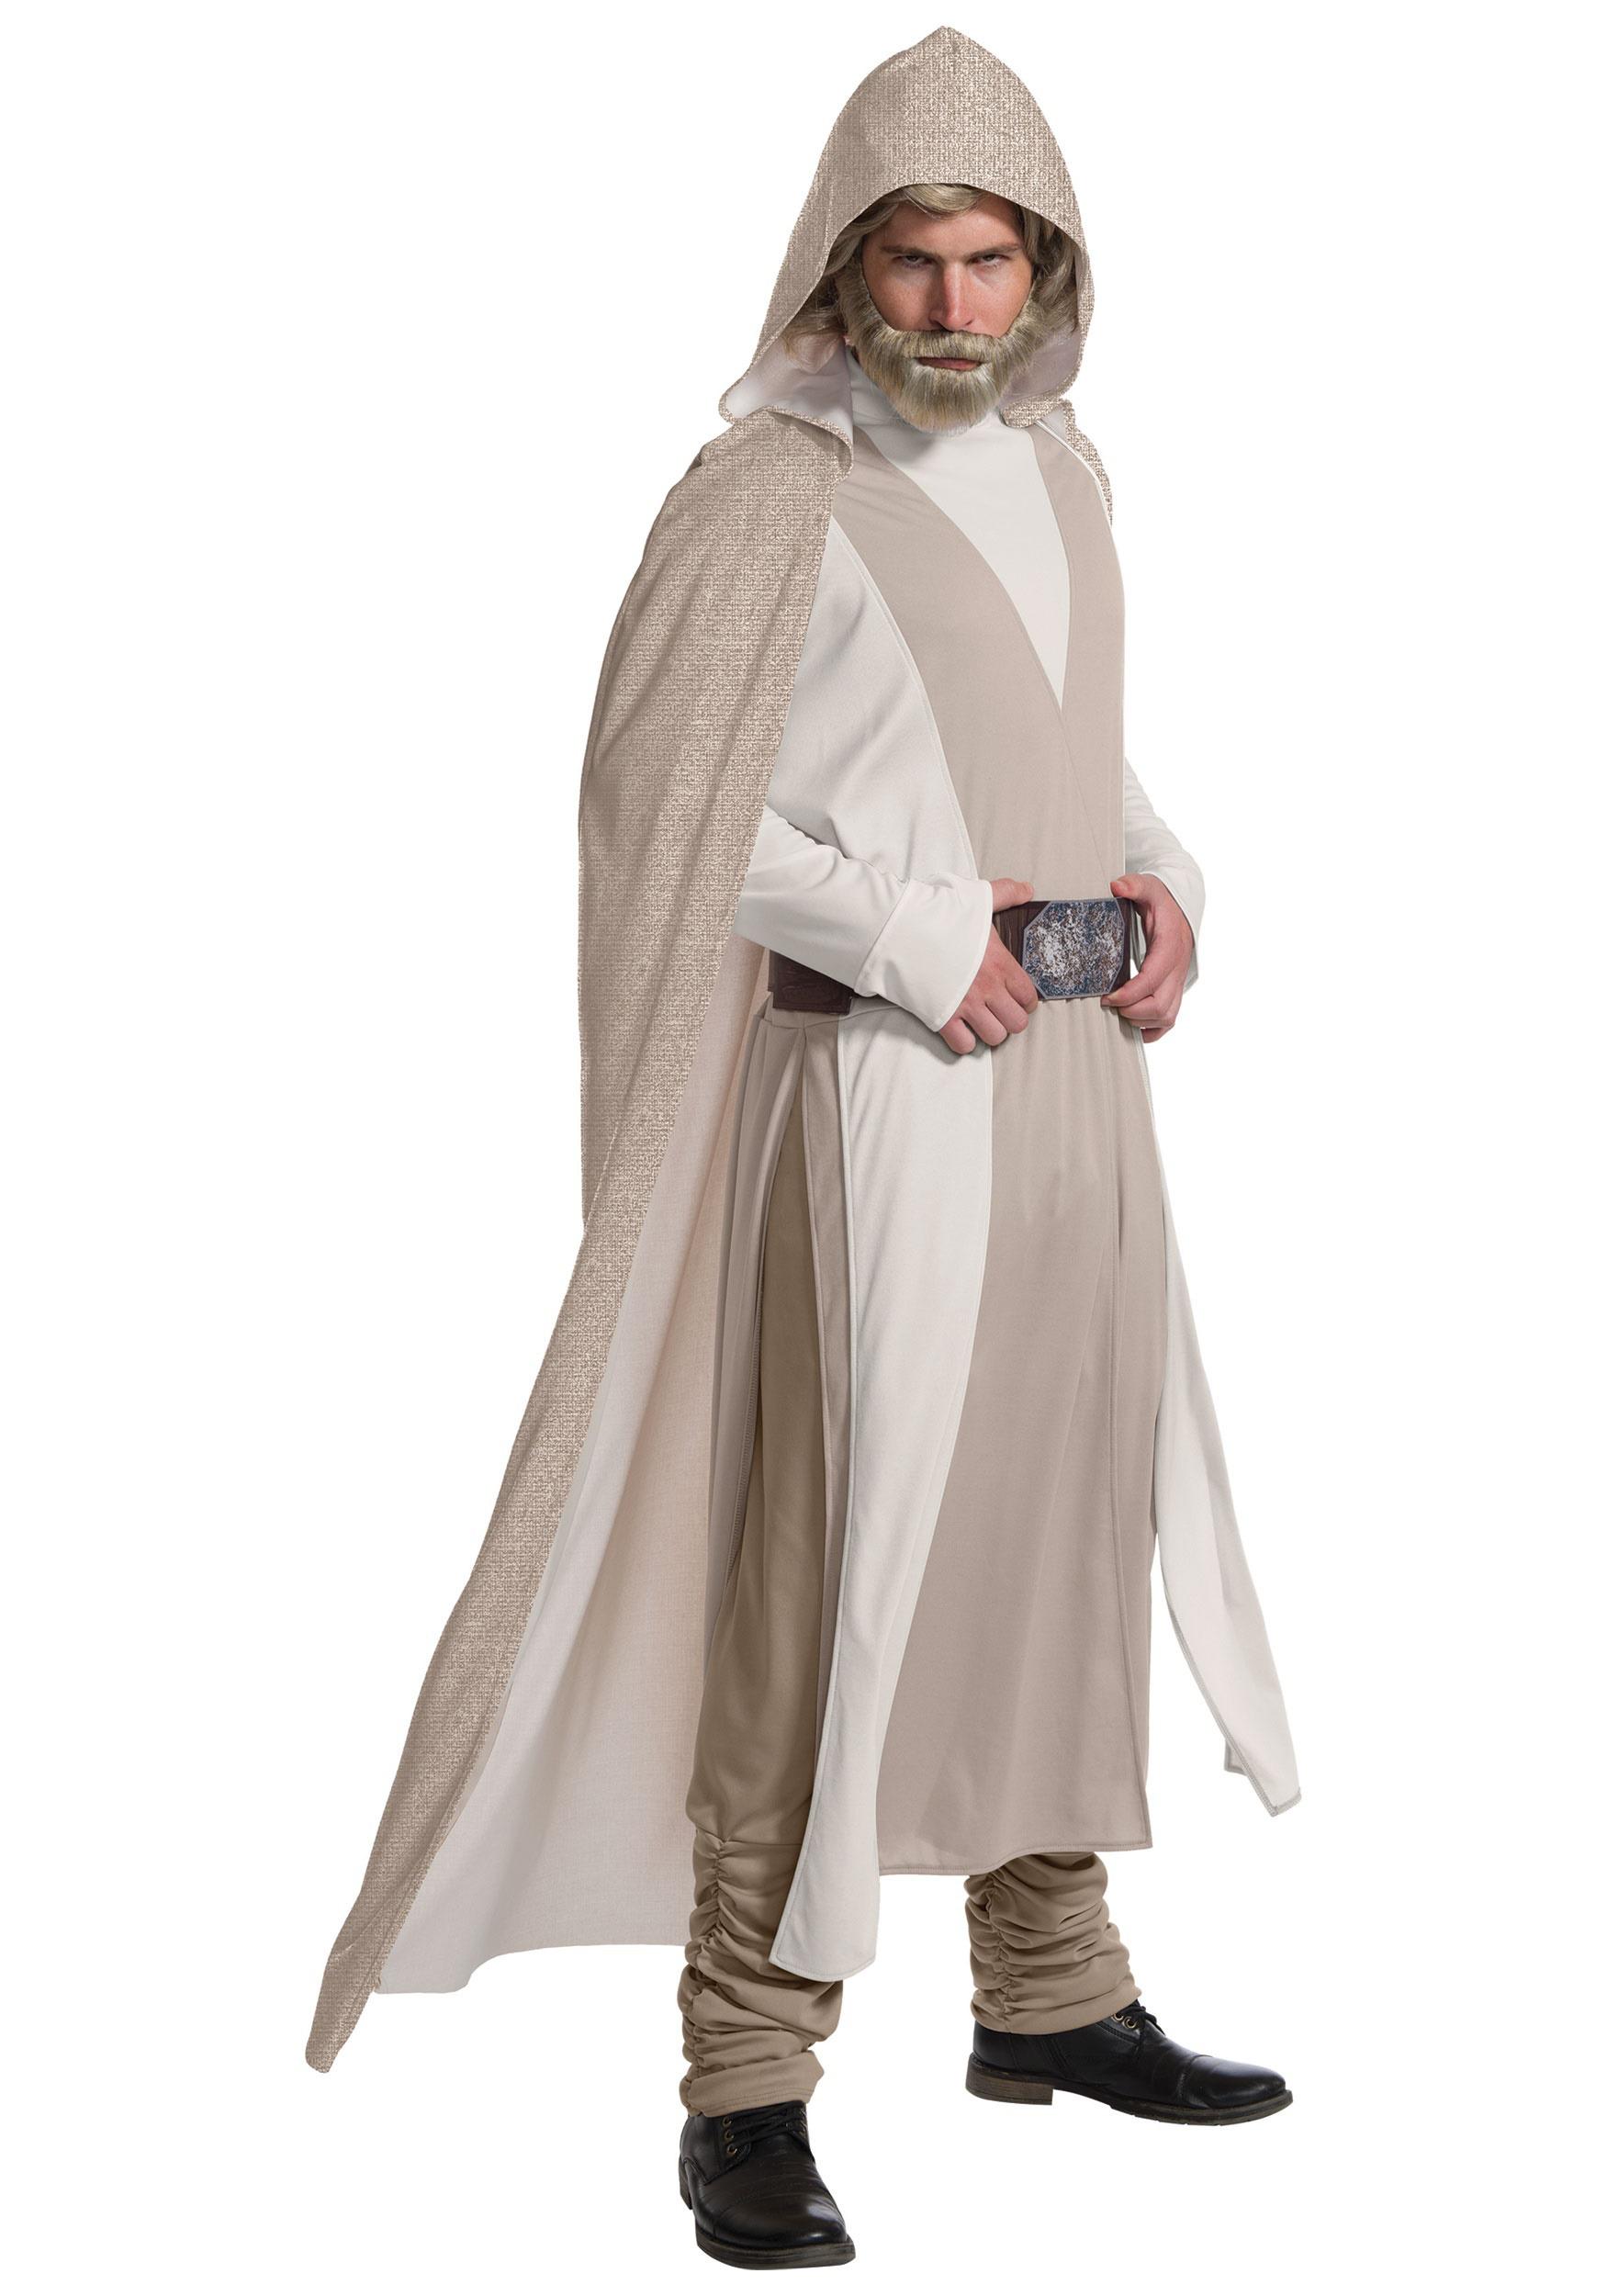 Star Wars The Last Jedi Deluxe Luke Skywalker Costume for Men